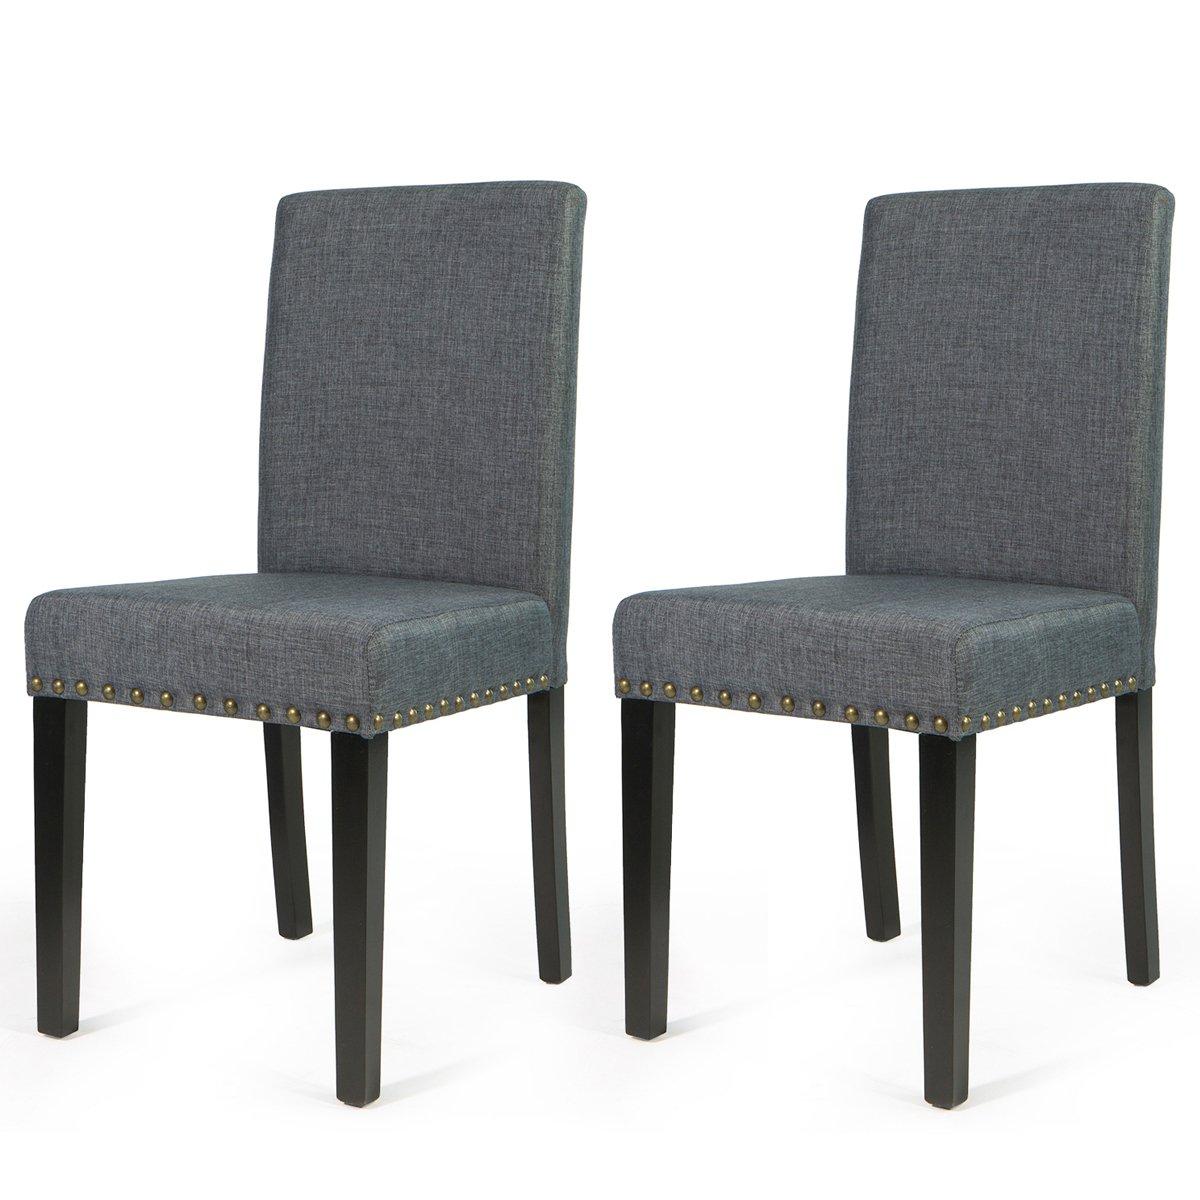 Barton Fabric Stylish Dining Chair Furniture with Nailhead Trim, Set of 2, Grey (Small)